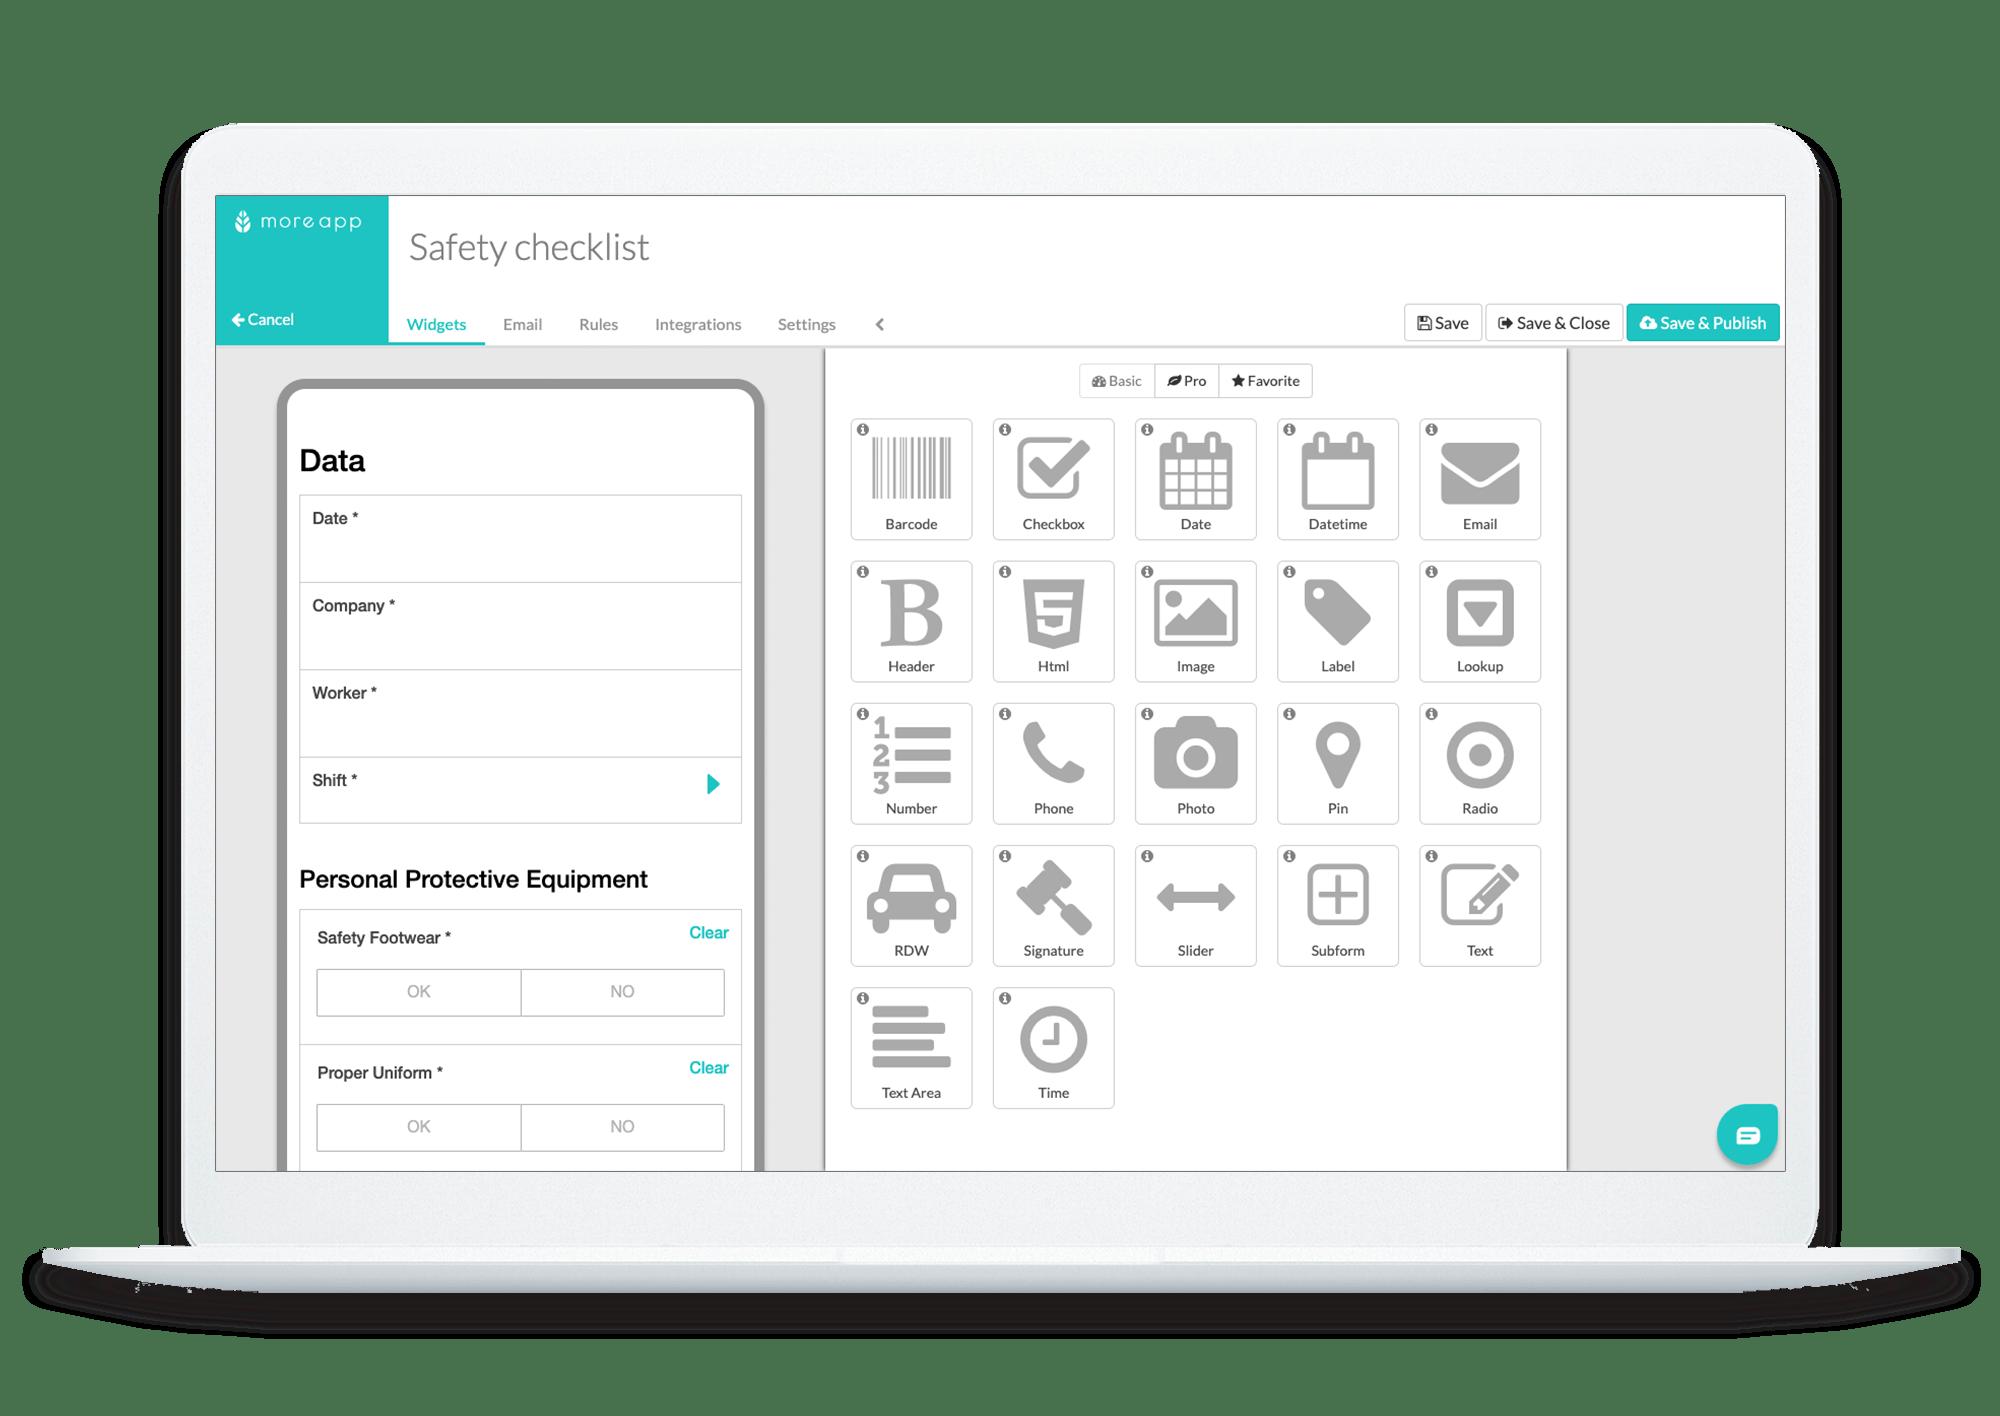 MoreApp Safety Checklist Form